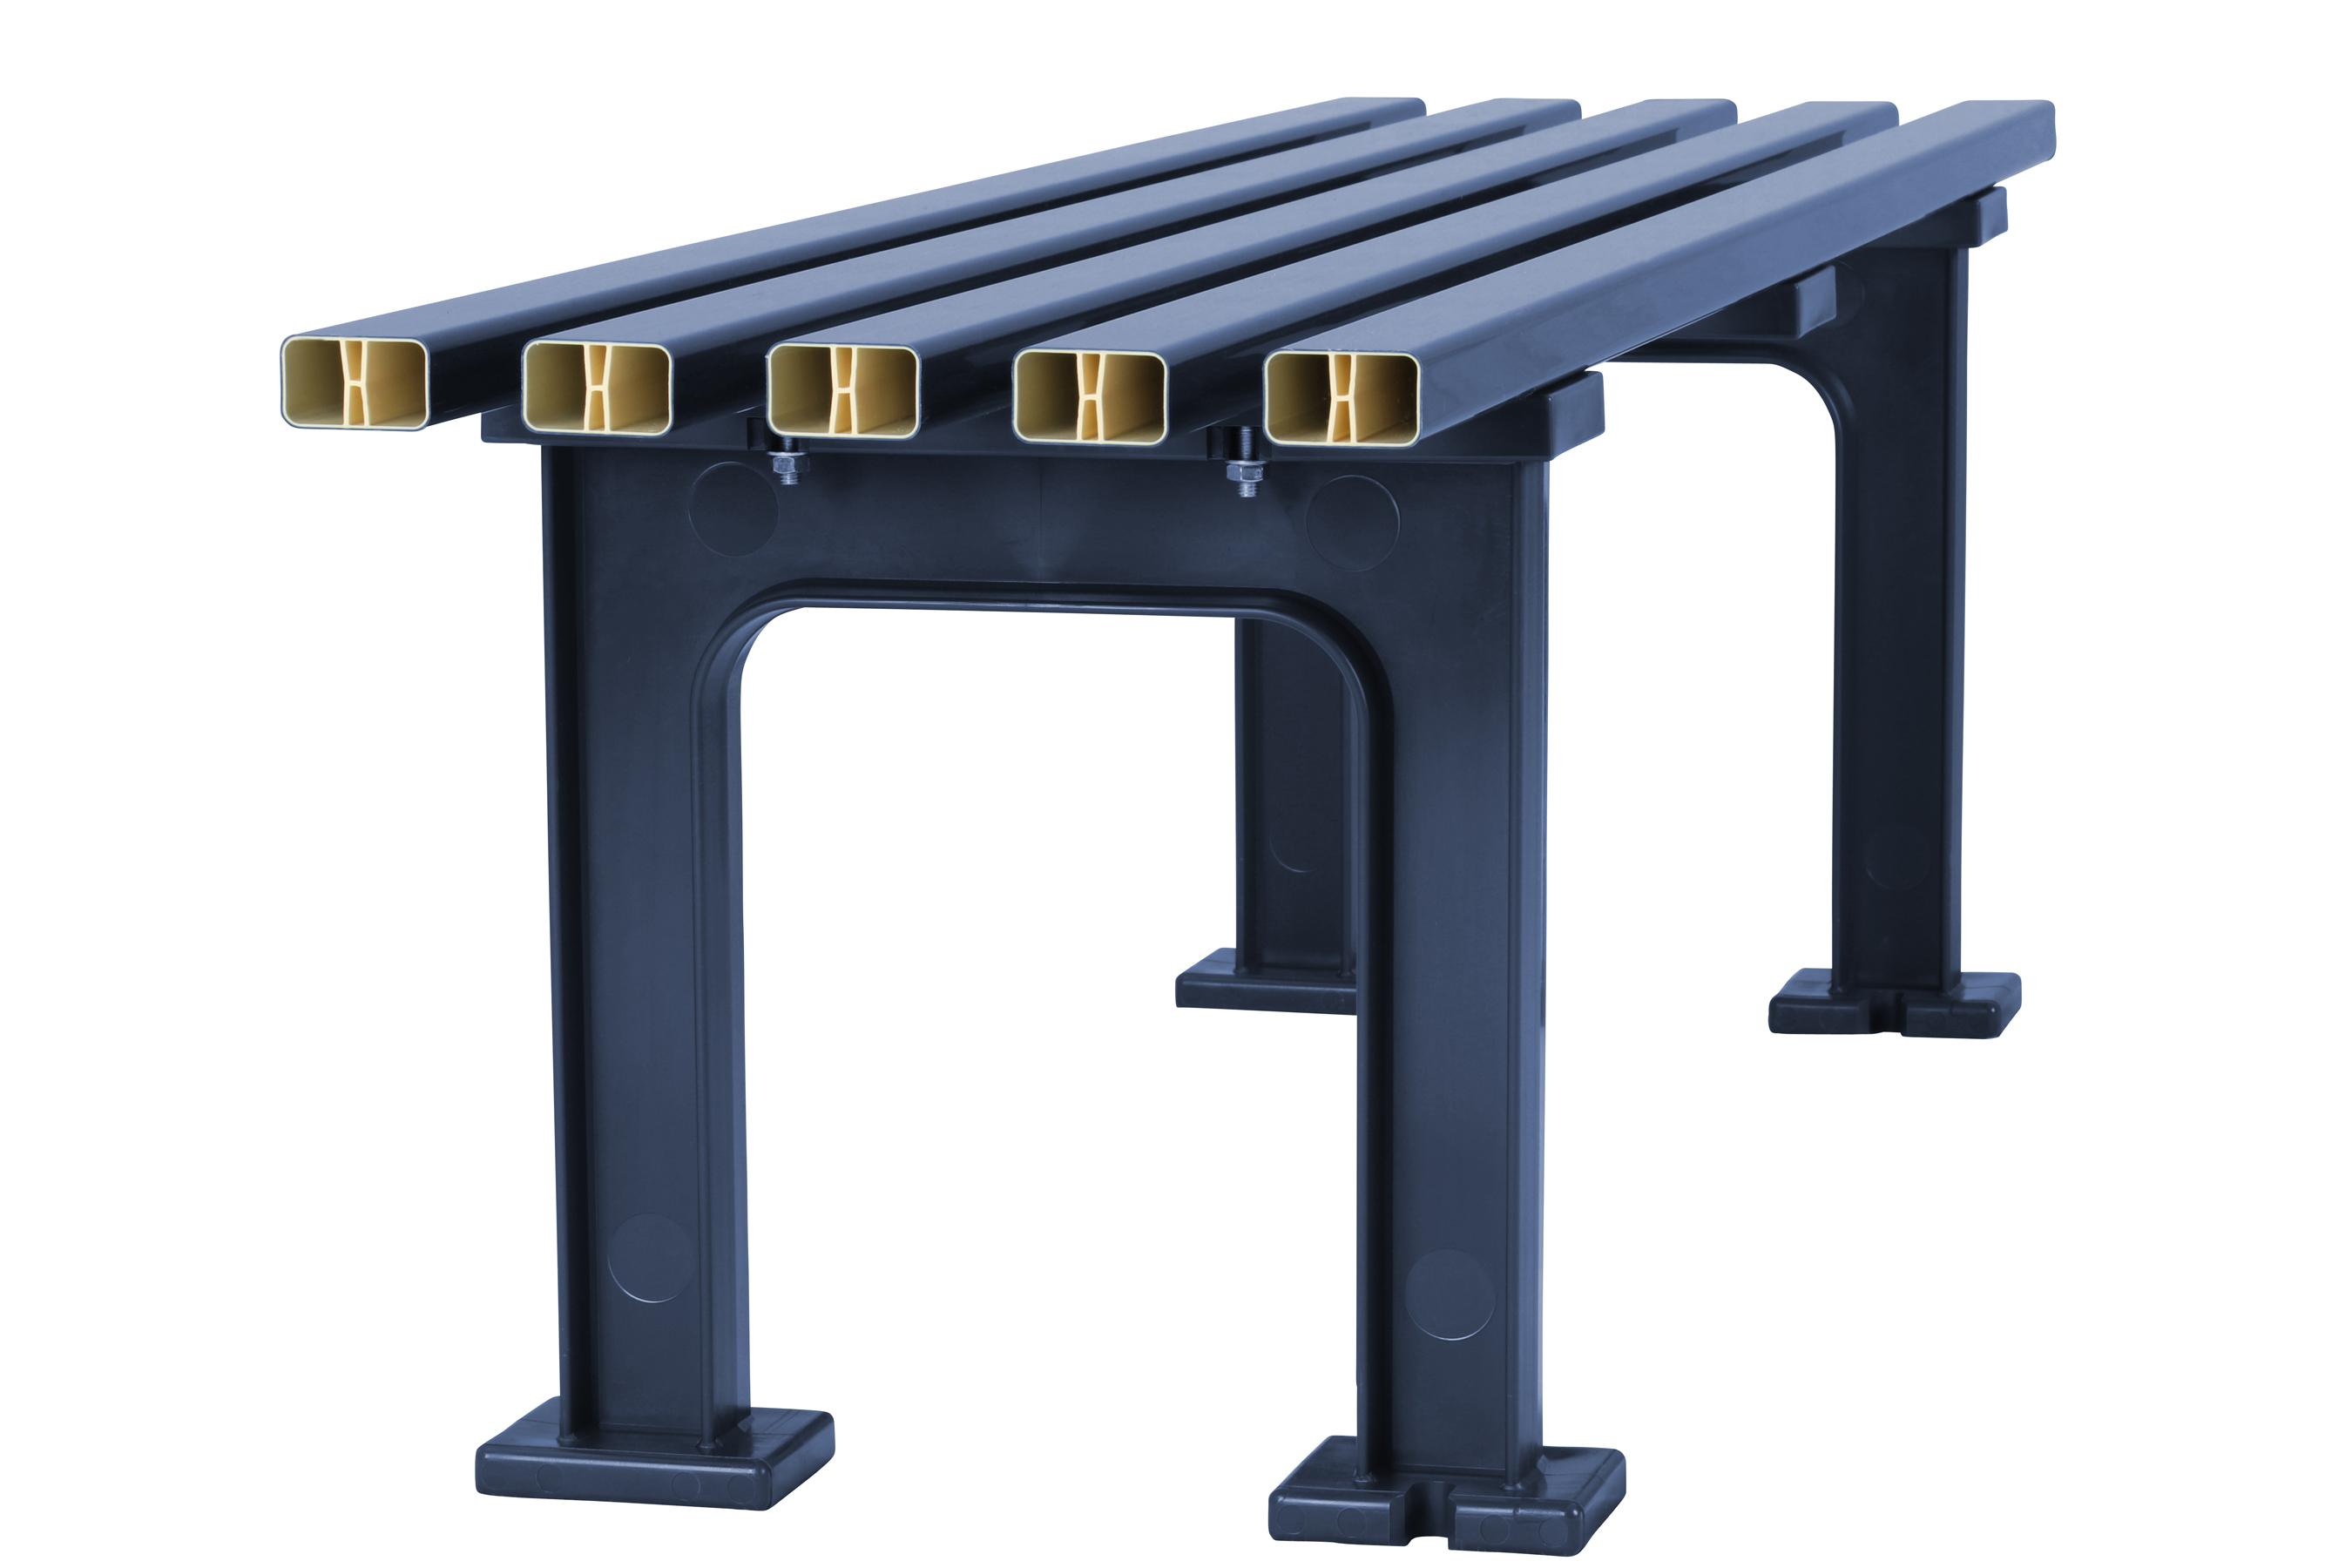 Blome Gartenbank / 3-Sitzer Bank Mono I Kunststoff blau 150cm Bild 4